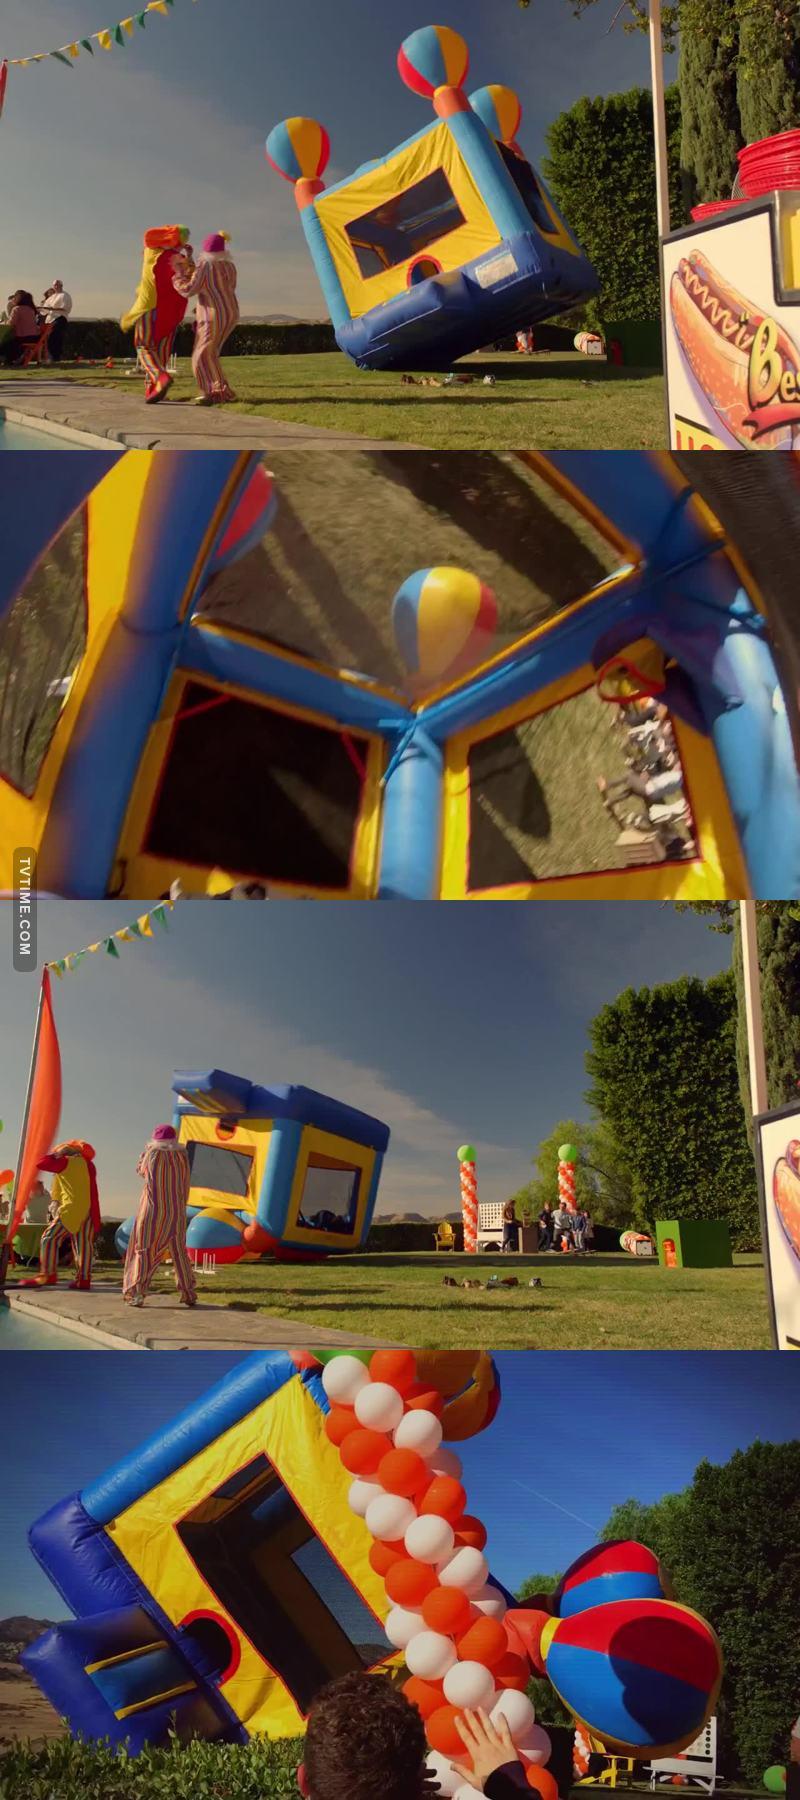 Last week it was rollercoasters this week it's bouncy houses, is Ryan Murphy waging a war on childhood fun?!